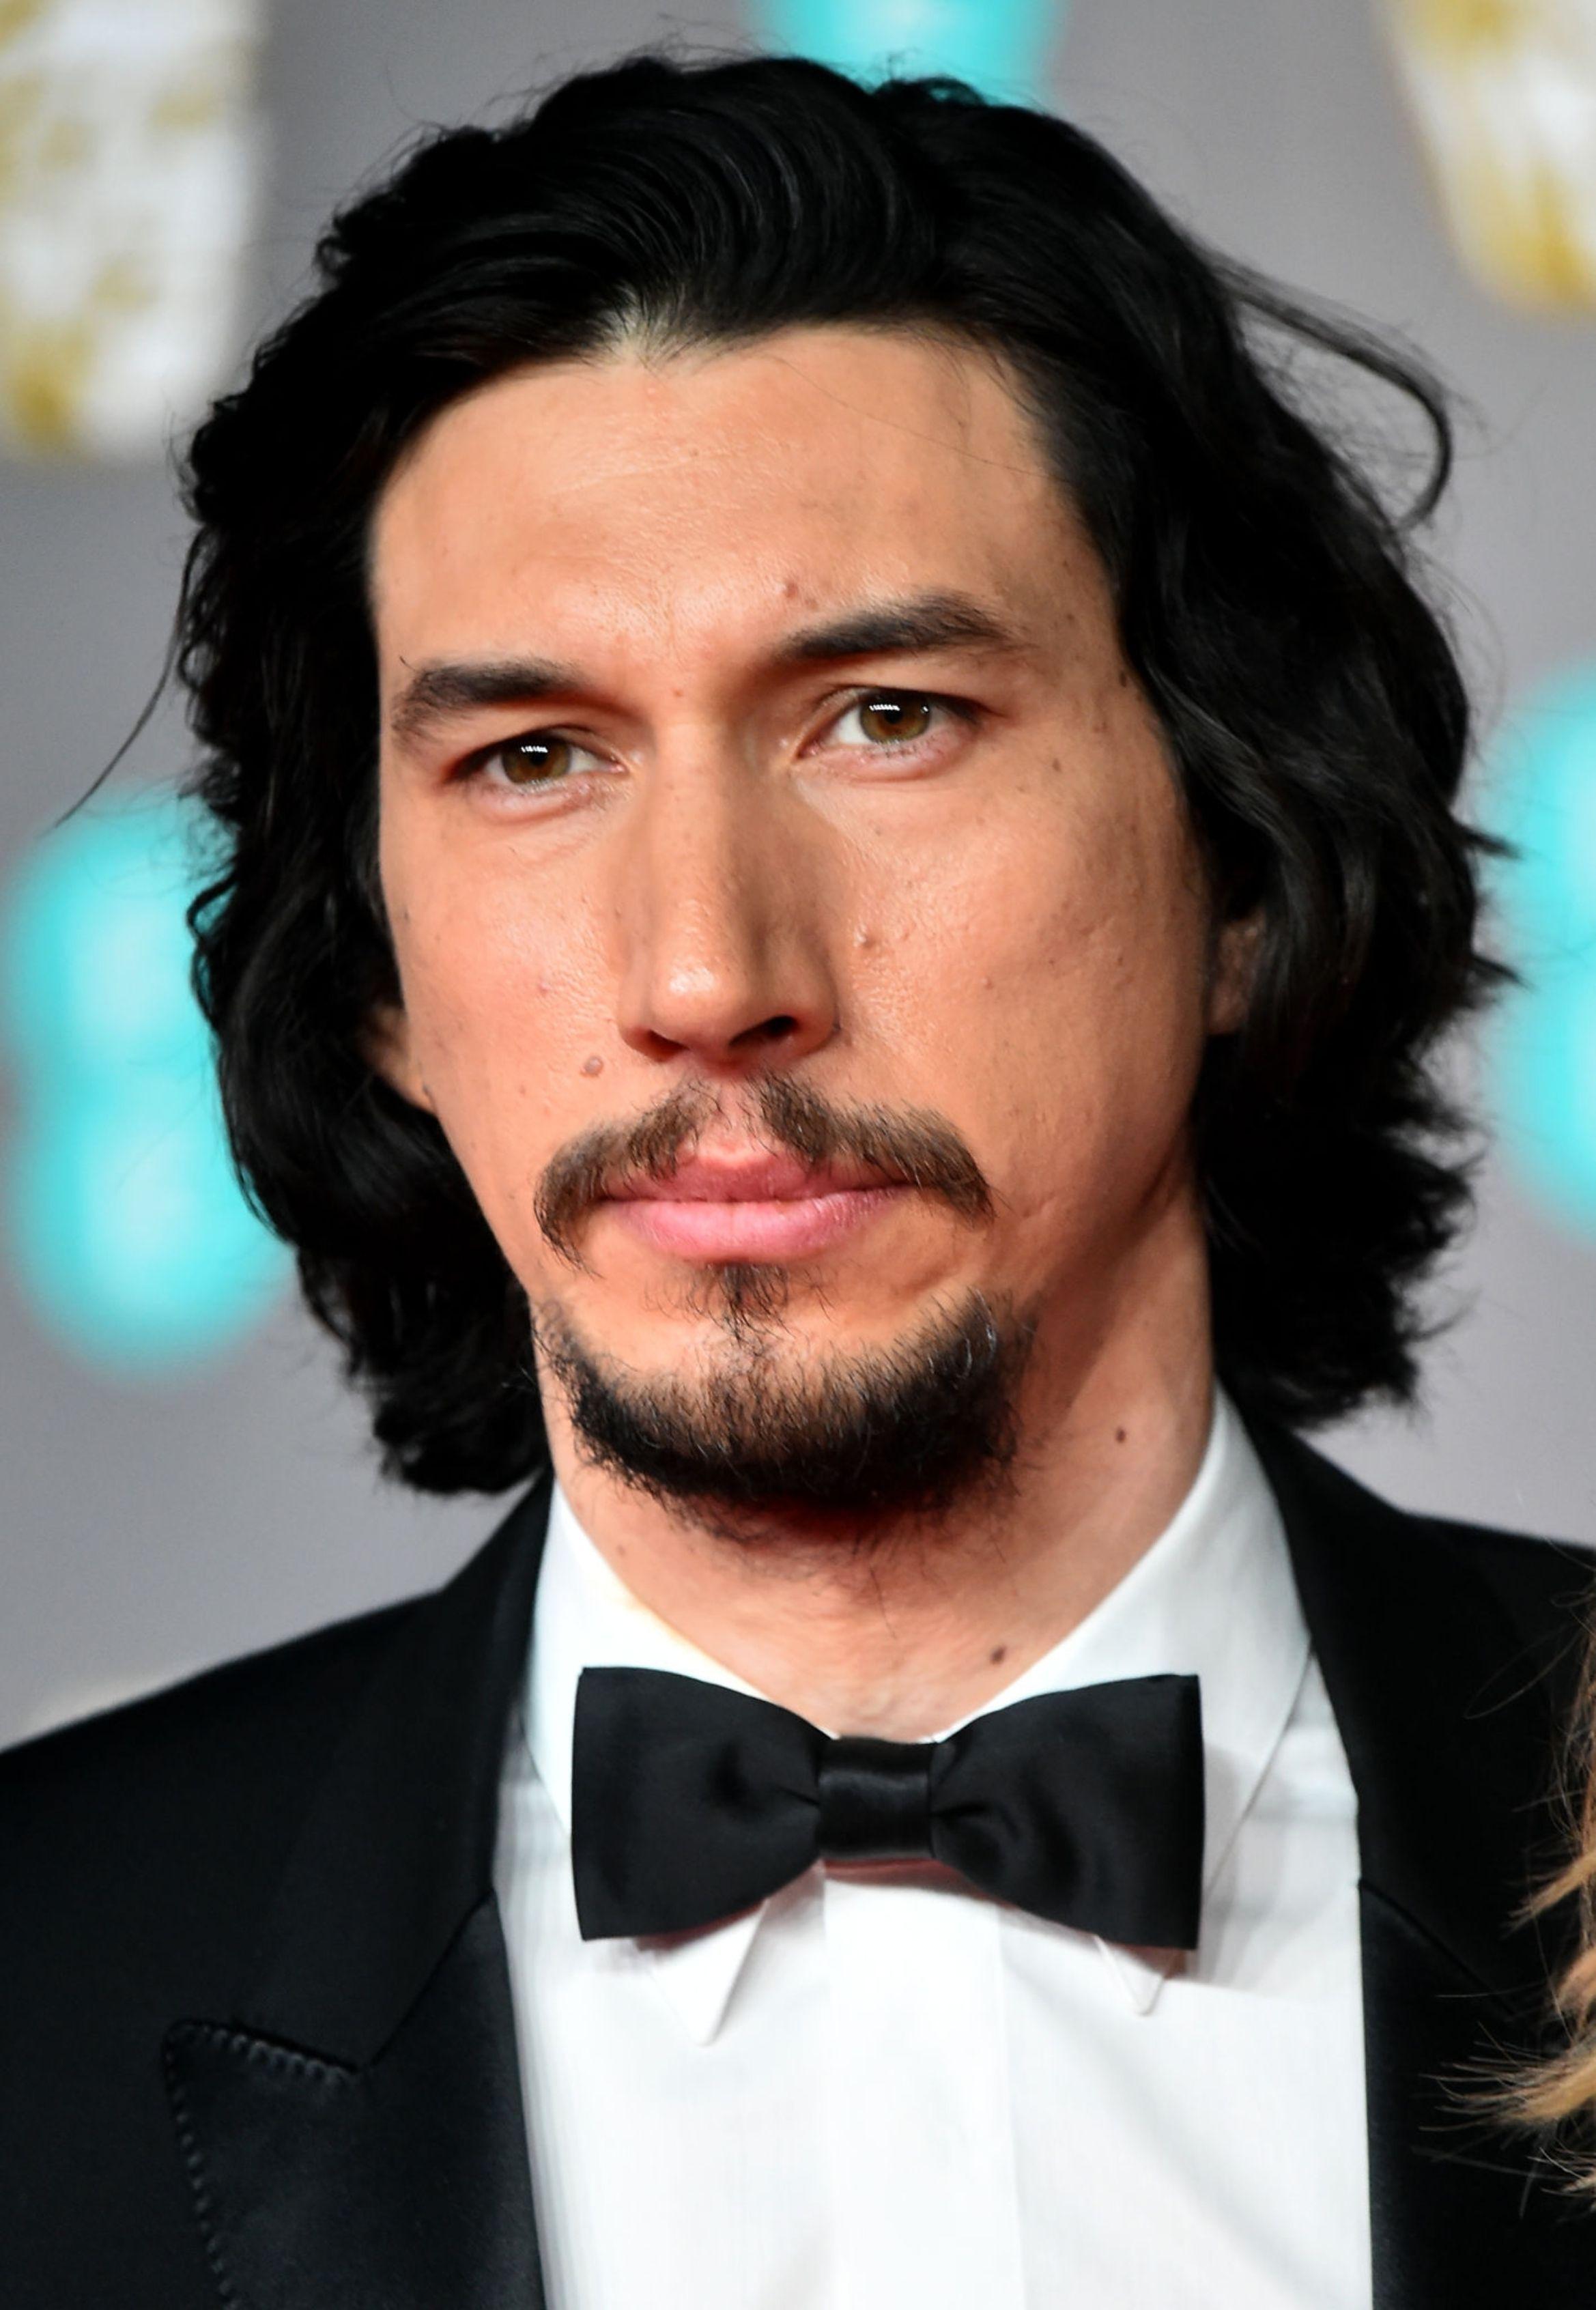 Pin By Alicia Parkinson On Adam Driver In 2020 Adam Driver Hot Actors Celebrities Male